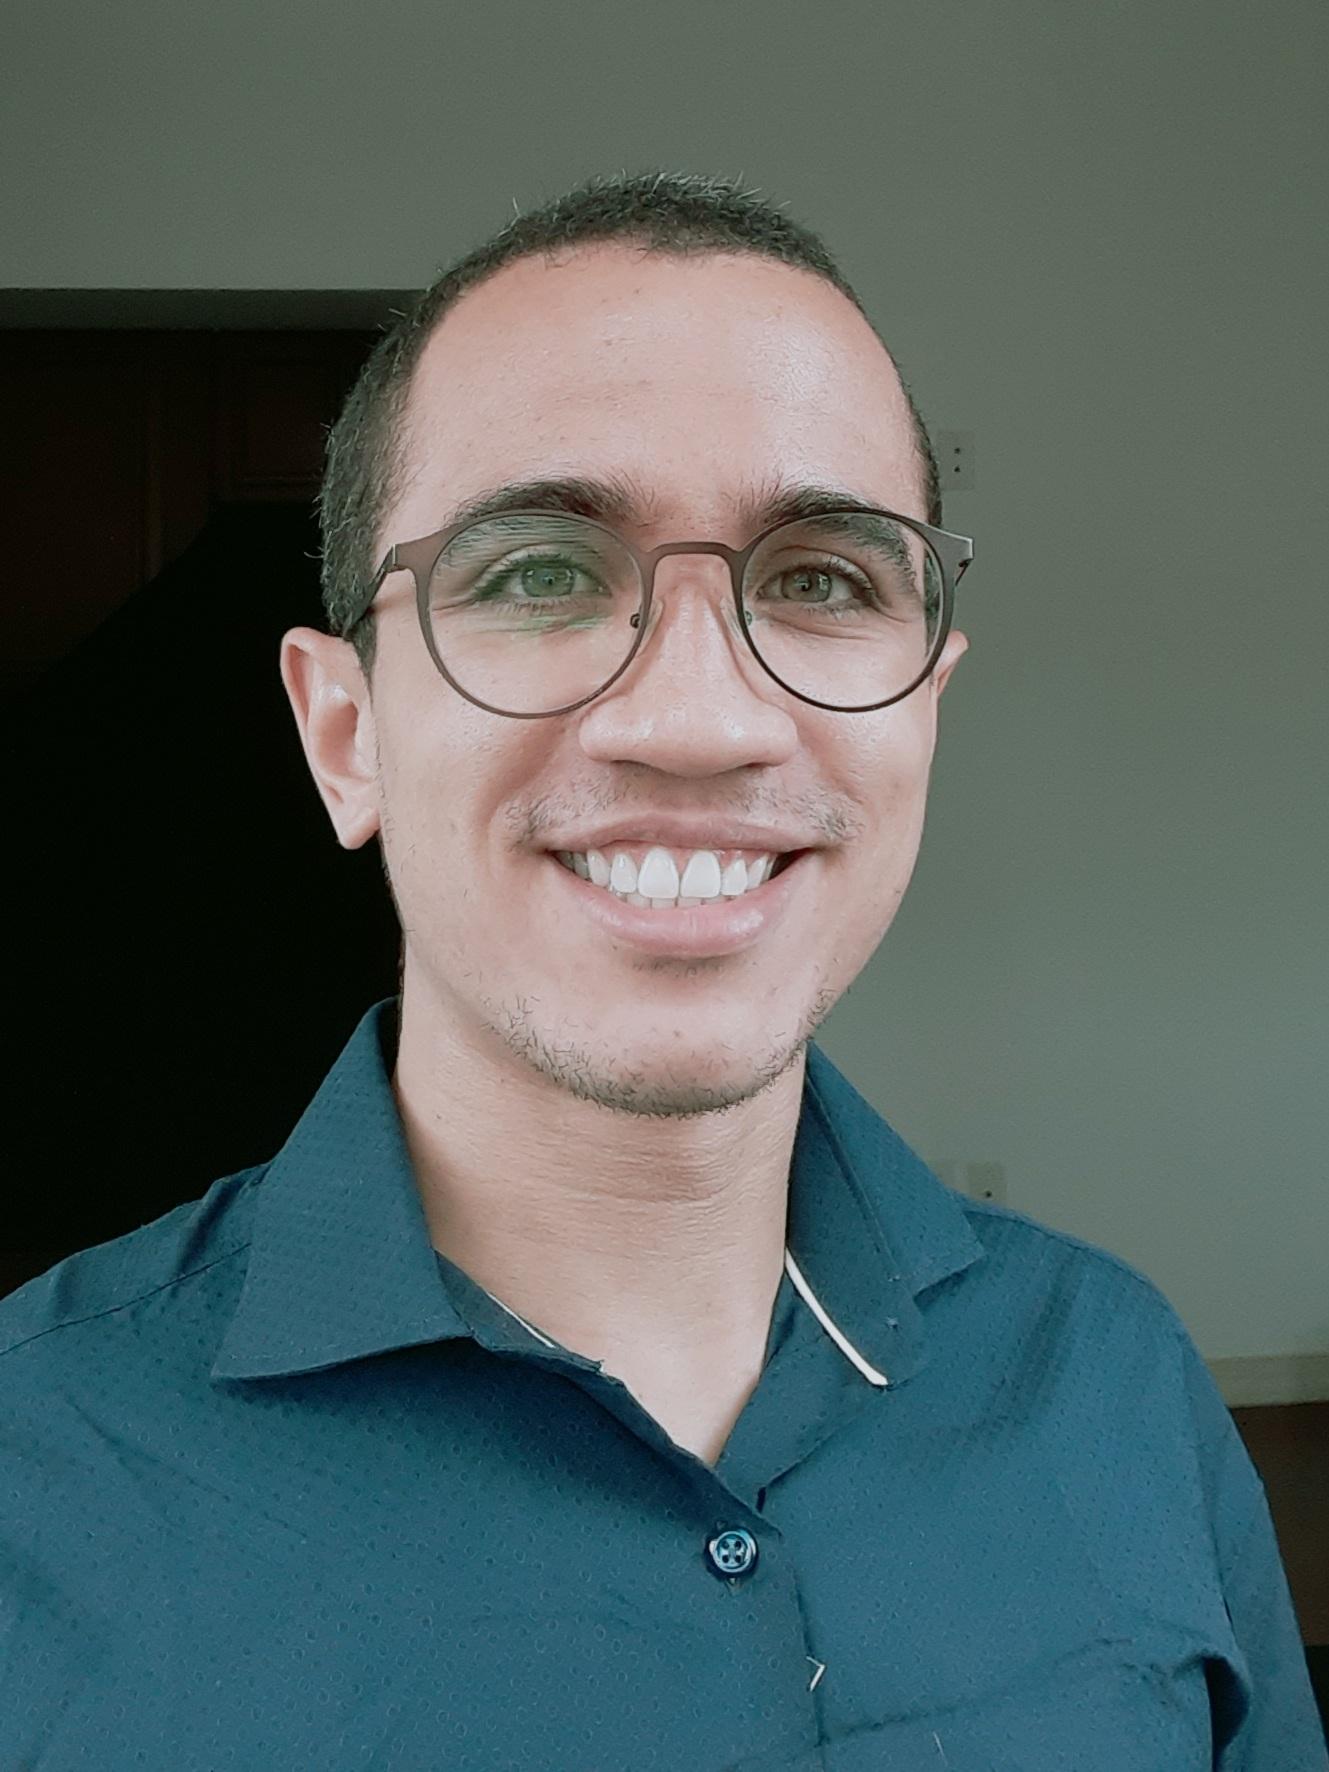 Thales Costa Silva